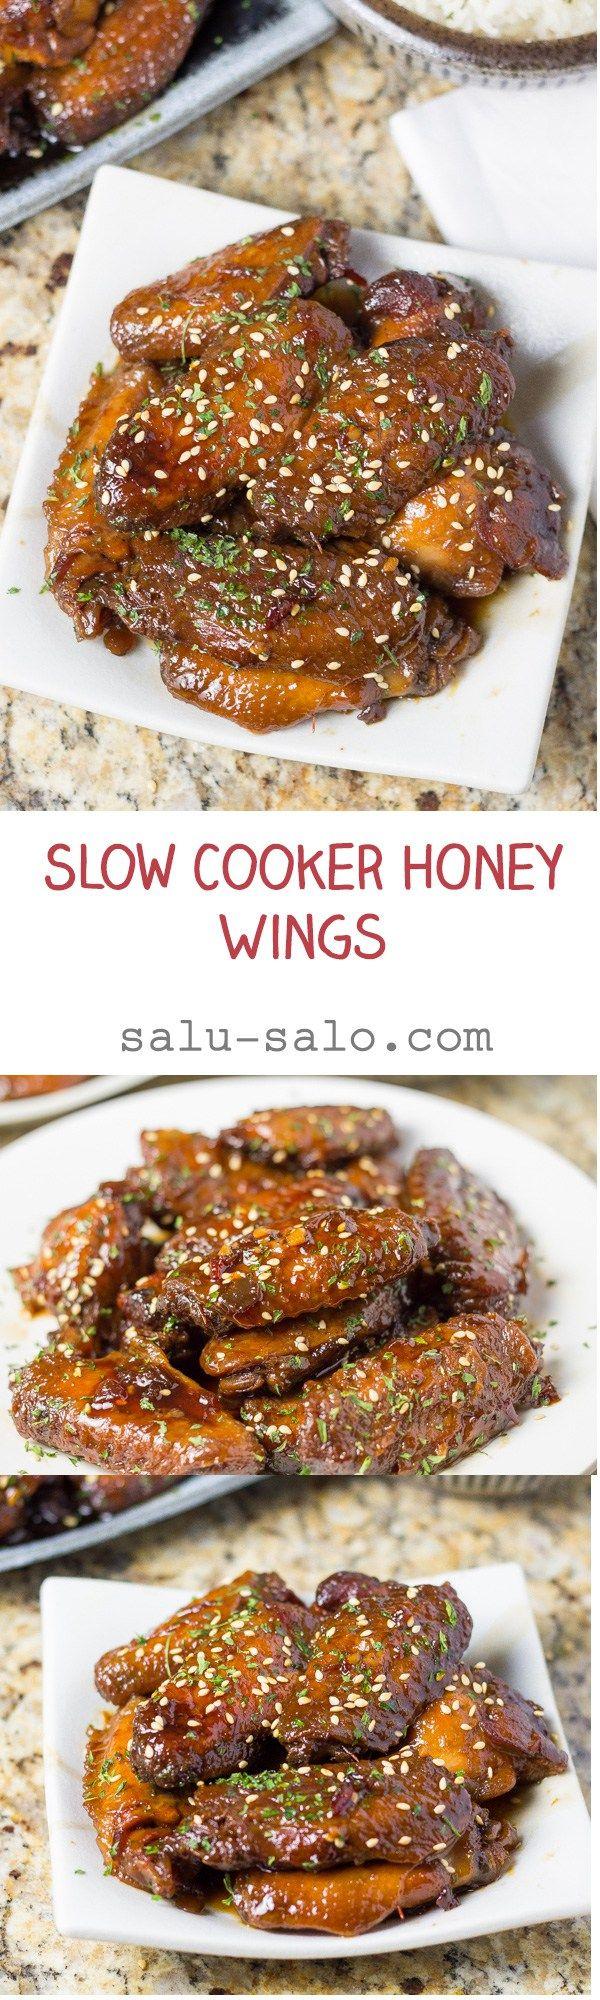 Slow Cooker Honey Wings